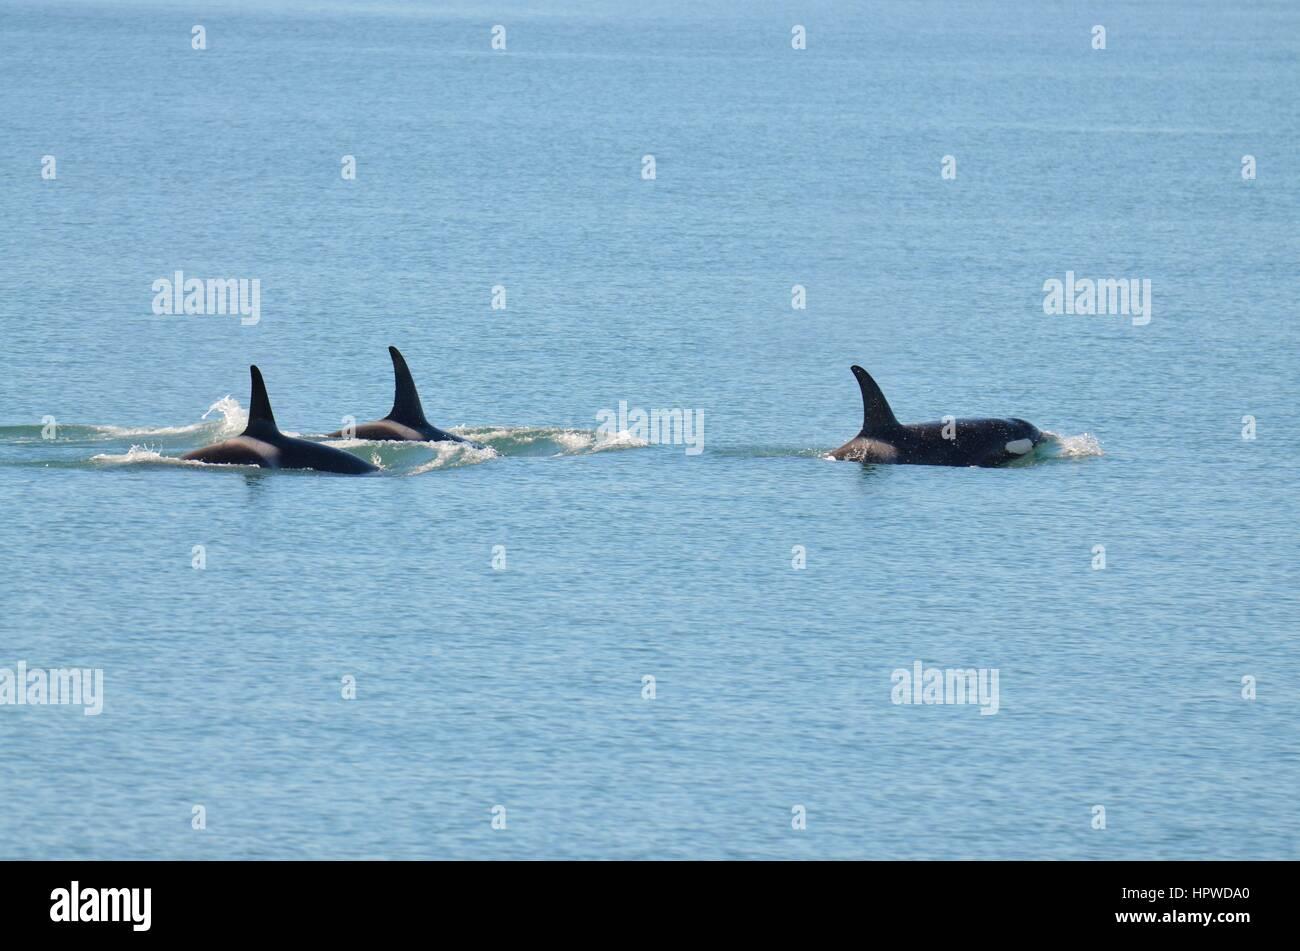 Alaskan Killer Whales - Stock Image